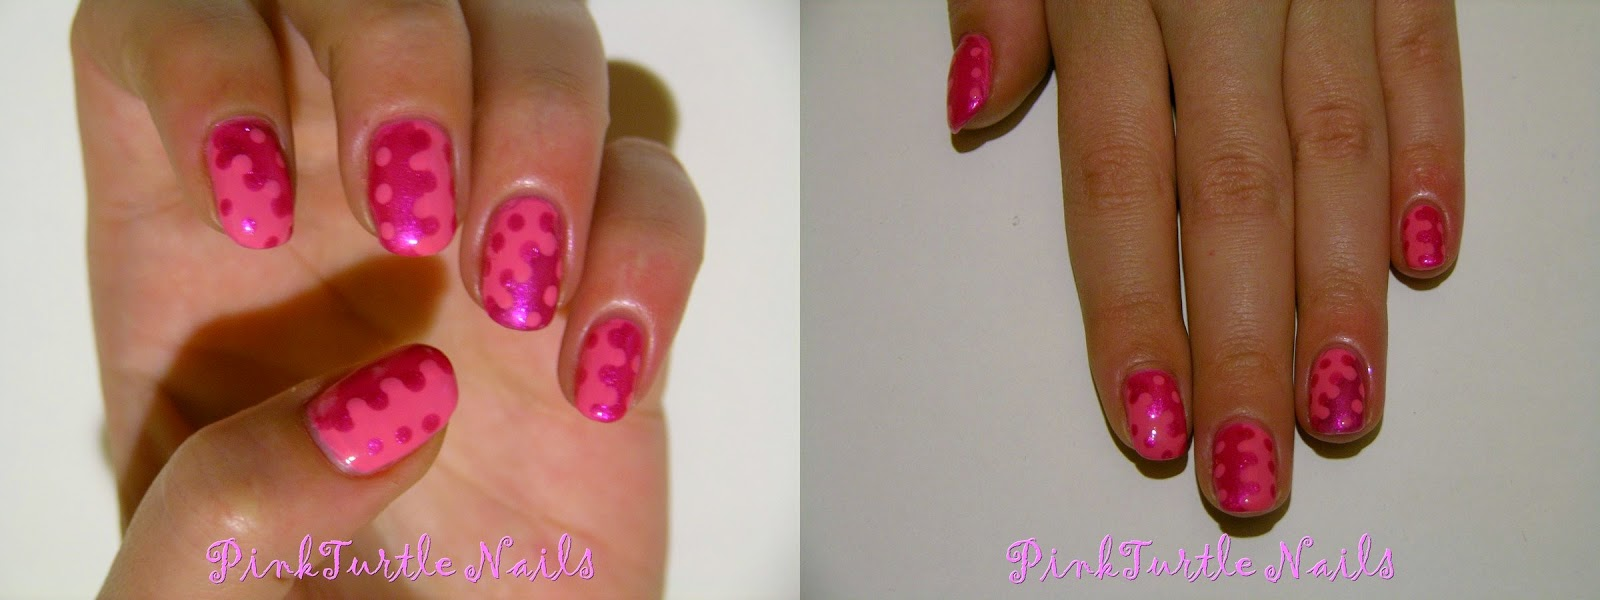 http://pinkturtlenails.blogspot.com.es/2015/03/reto-31-dias-color.html